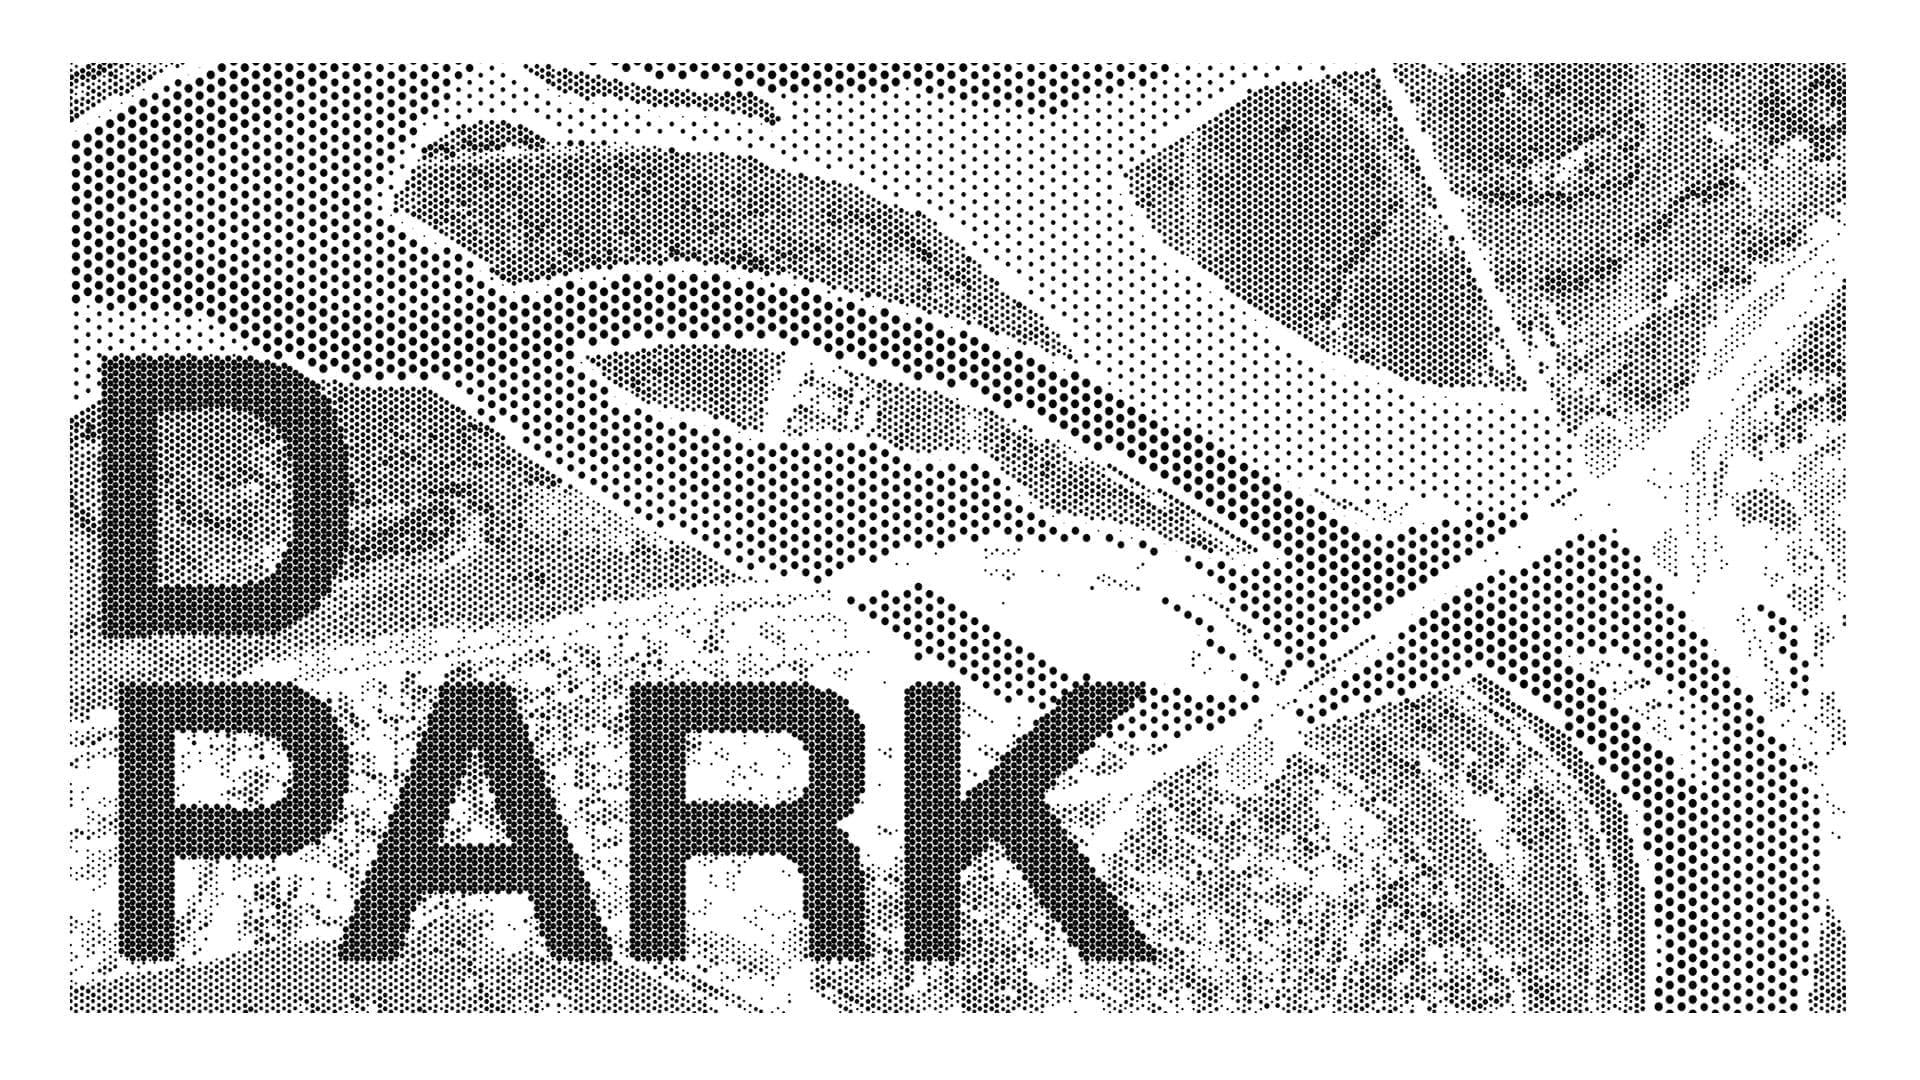 Highland Park Community Center Signage perforation pattern detail.